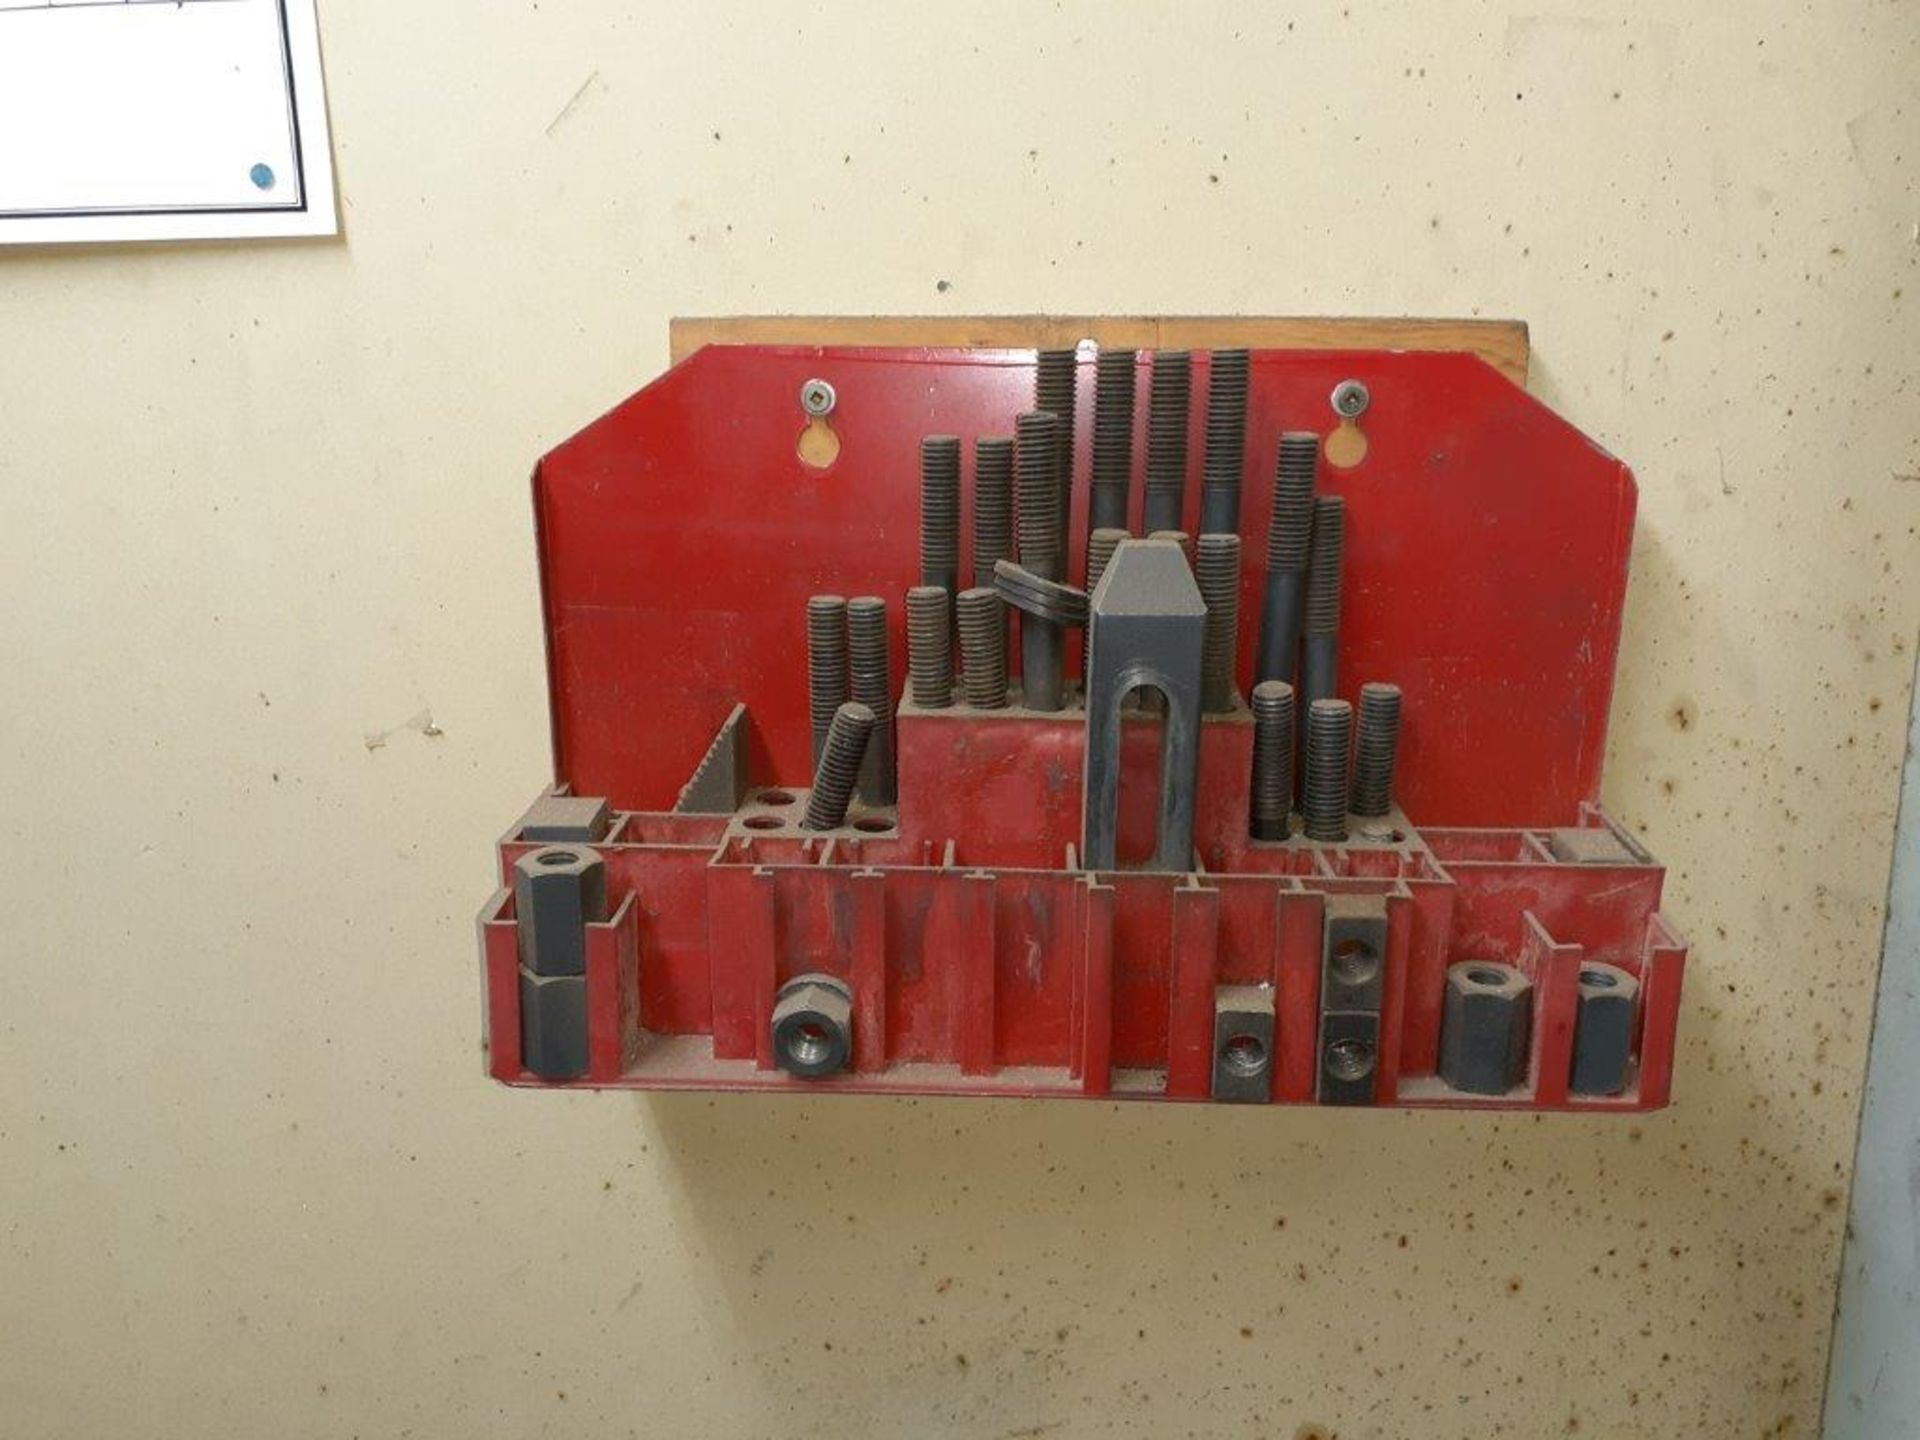 ALEXANDER PENTAGRAPH Machine, mod: 3A, c/w Metal Cabinet & Assorted Parts - Image 5 of 8